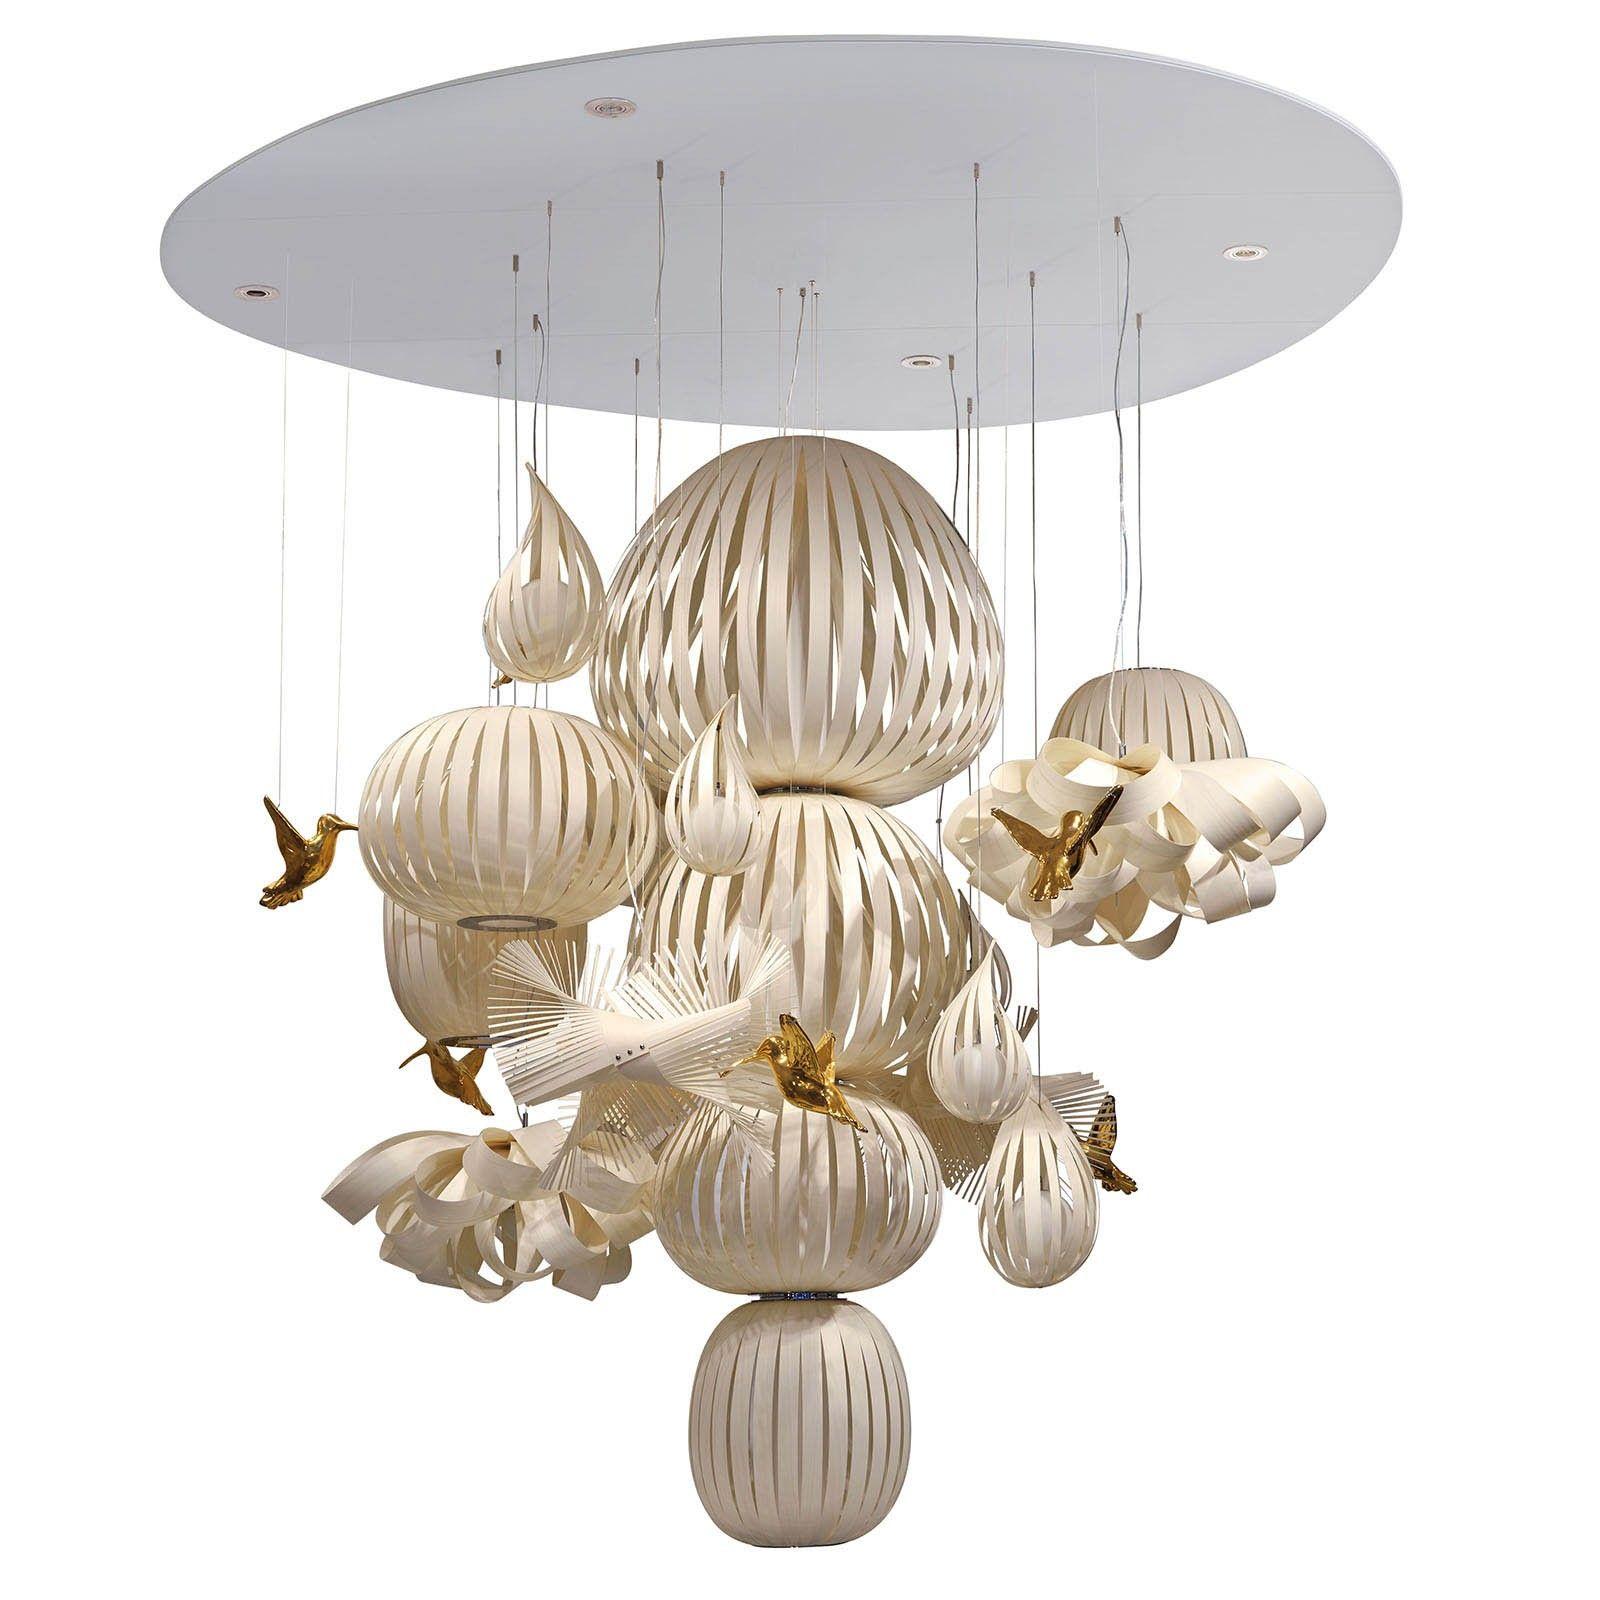 lzf marivi calvo candelabro suspension light designer